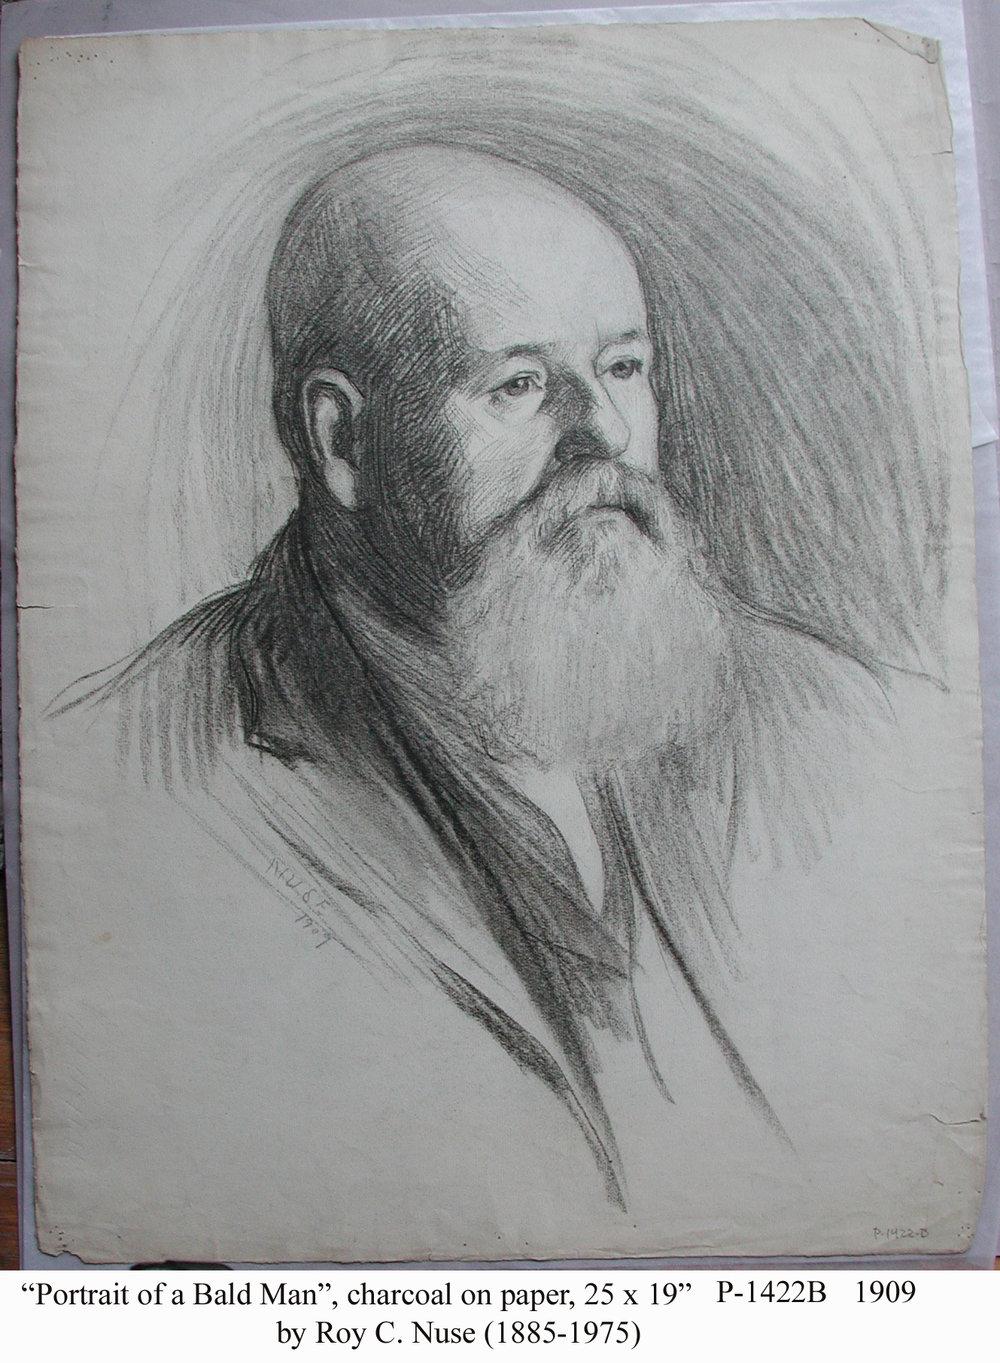 P-1422B Portrait of a Bald Man copy.jpg